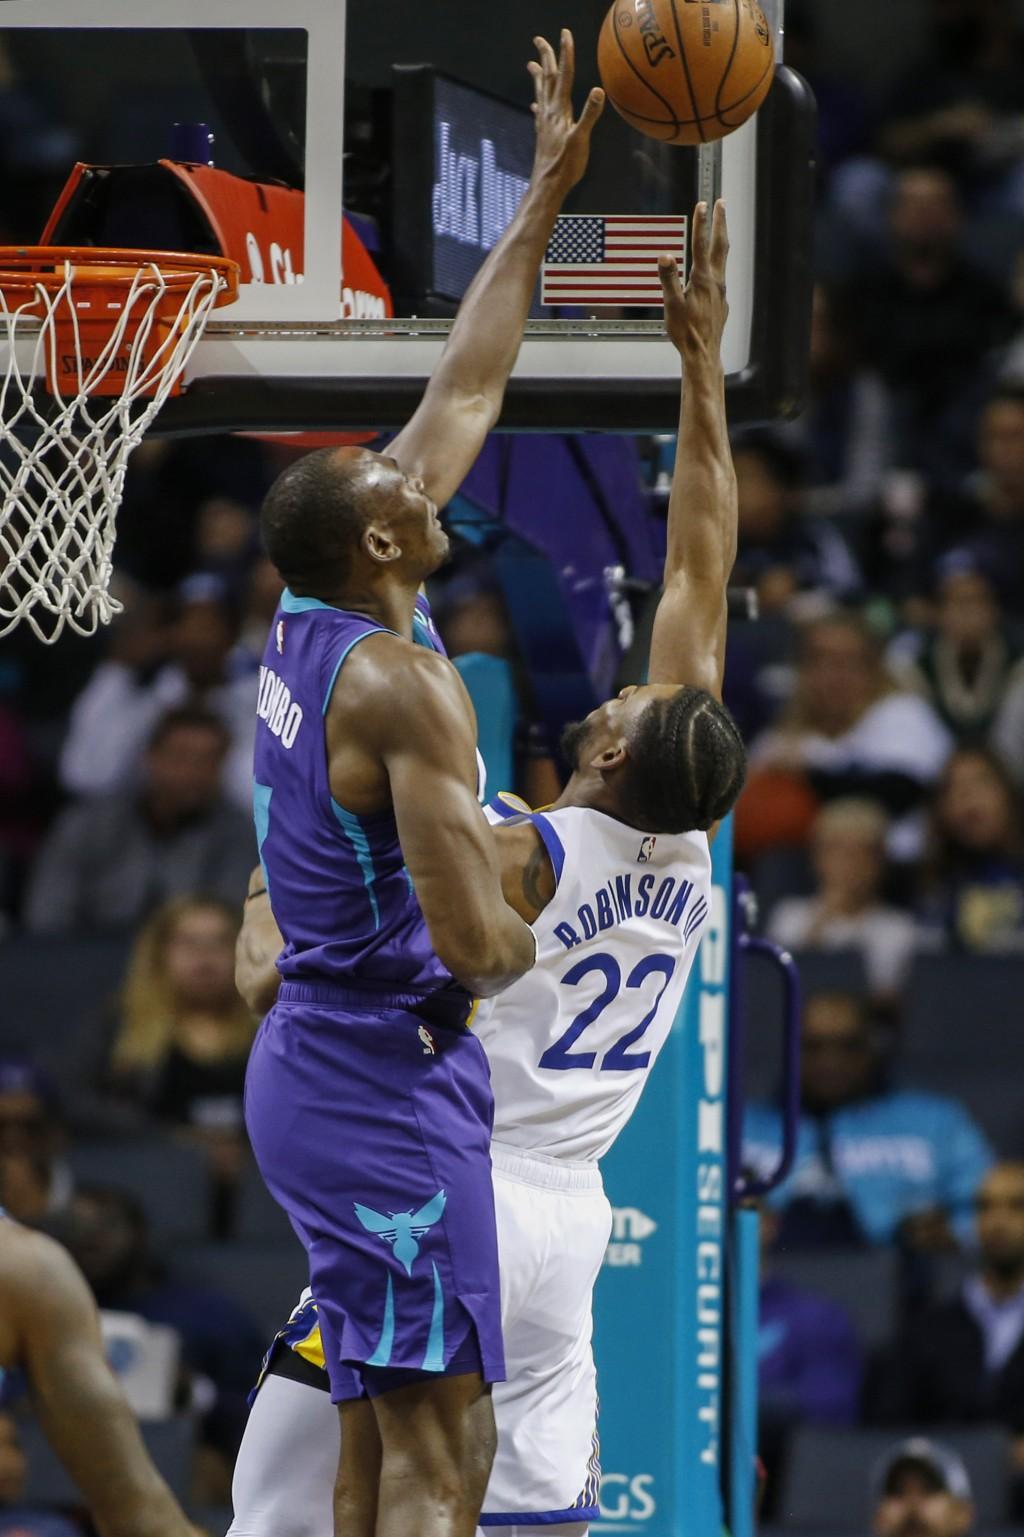 Golden State Warriors forward Glenn Robinson III (22) shoots as Charlotte Hornets center Bismack Biyombo defends during the first half of an NBA baske...